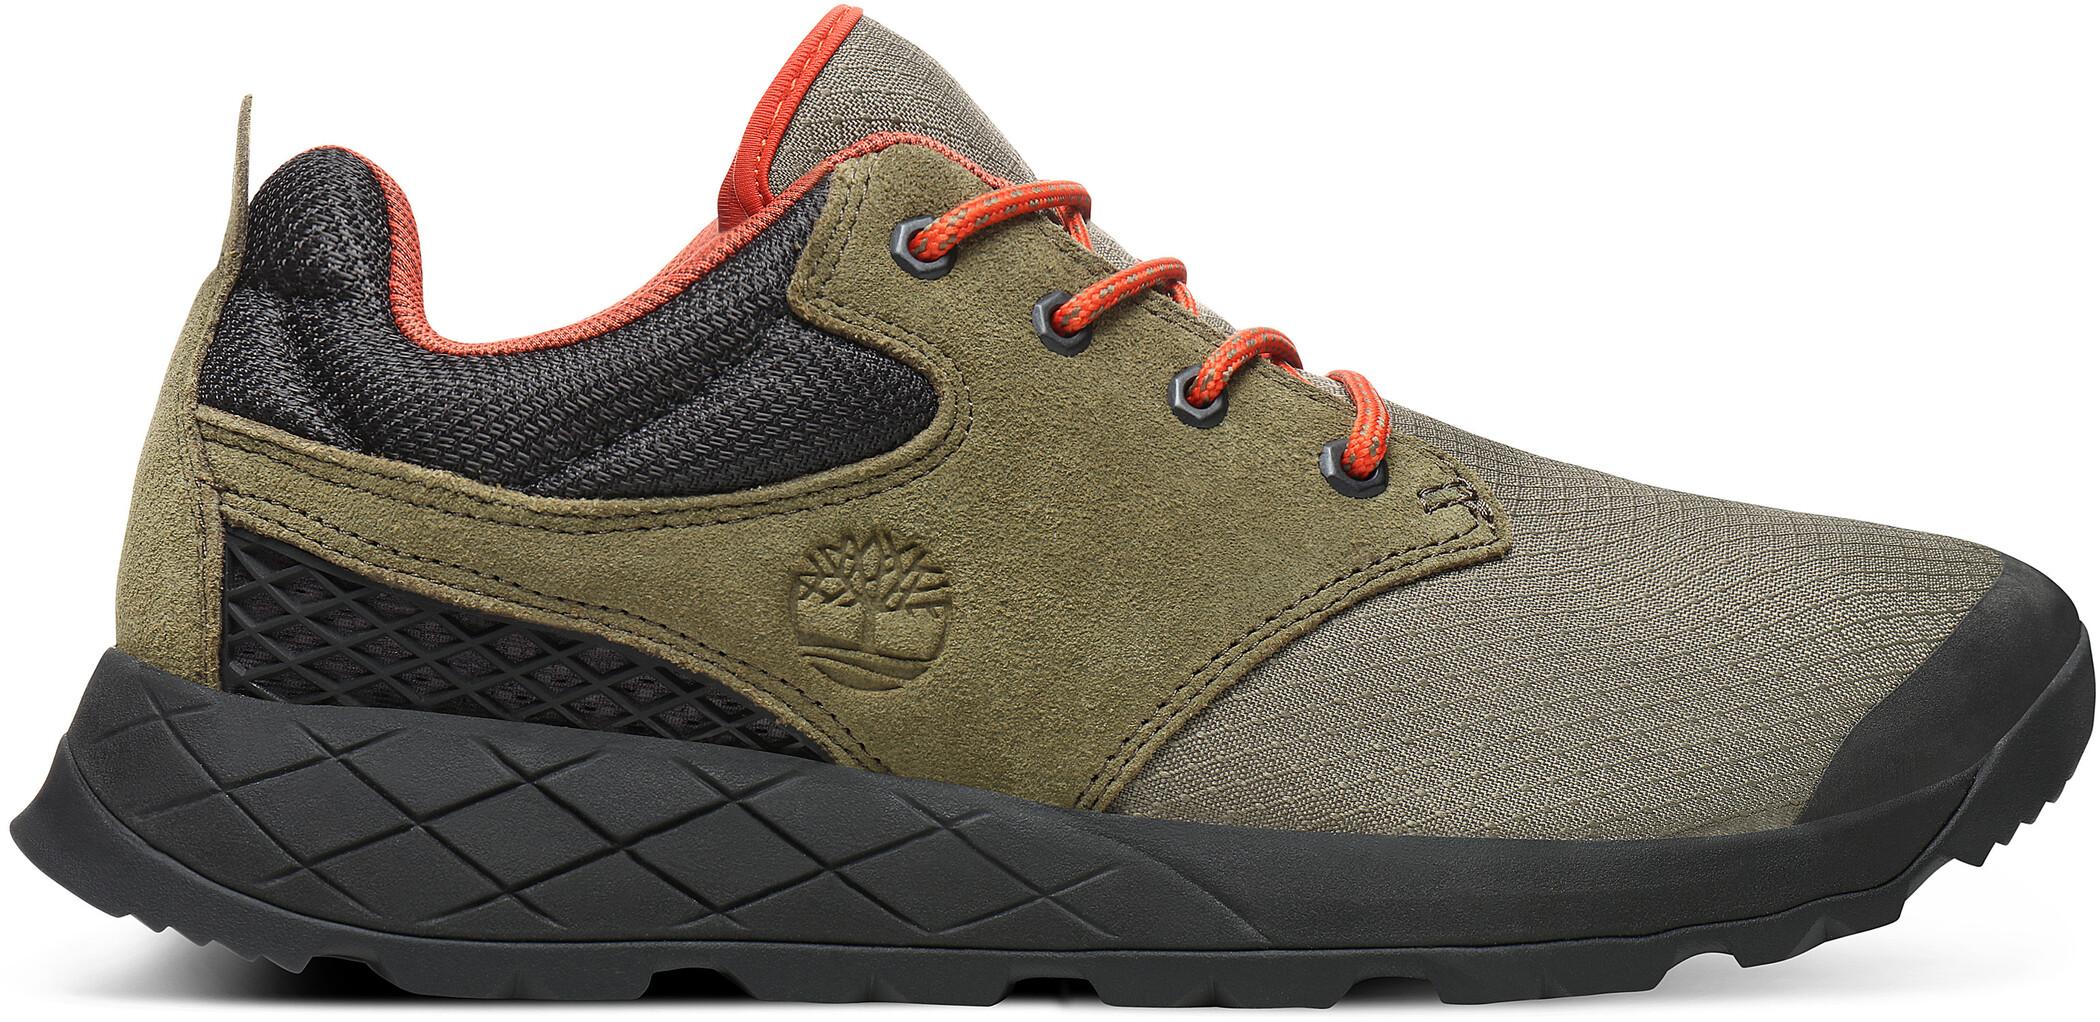 Timberland Tuckerman Low Cut Schuhe Herren dark olive